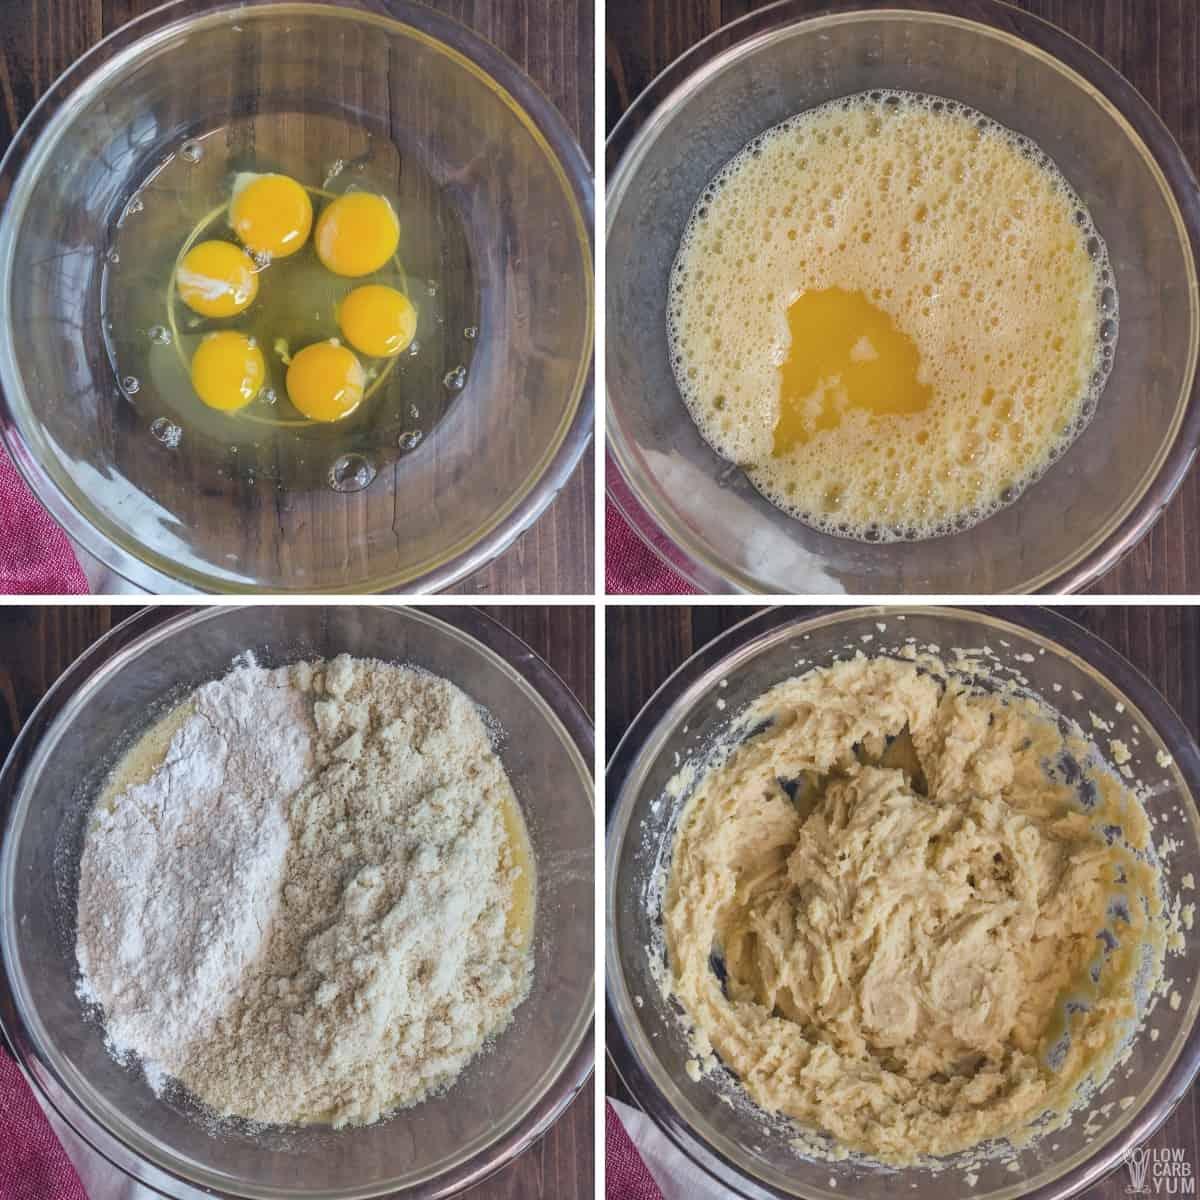 making the keto bread batter